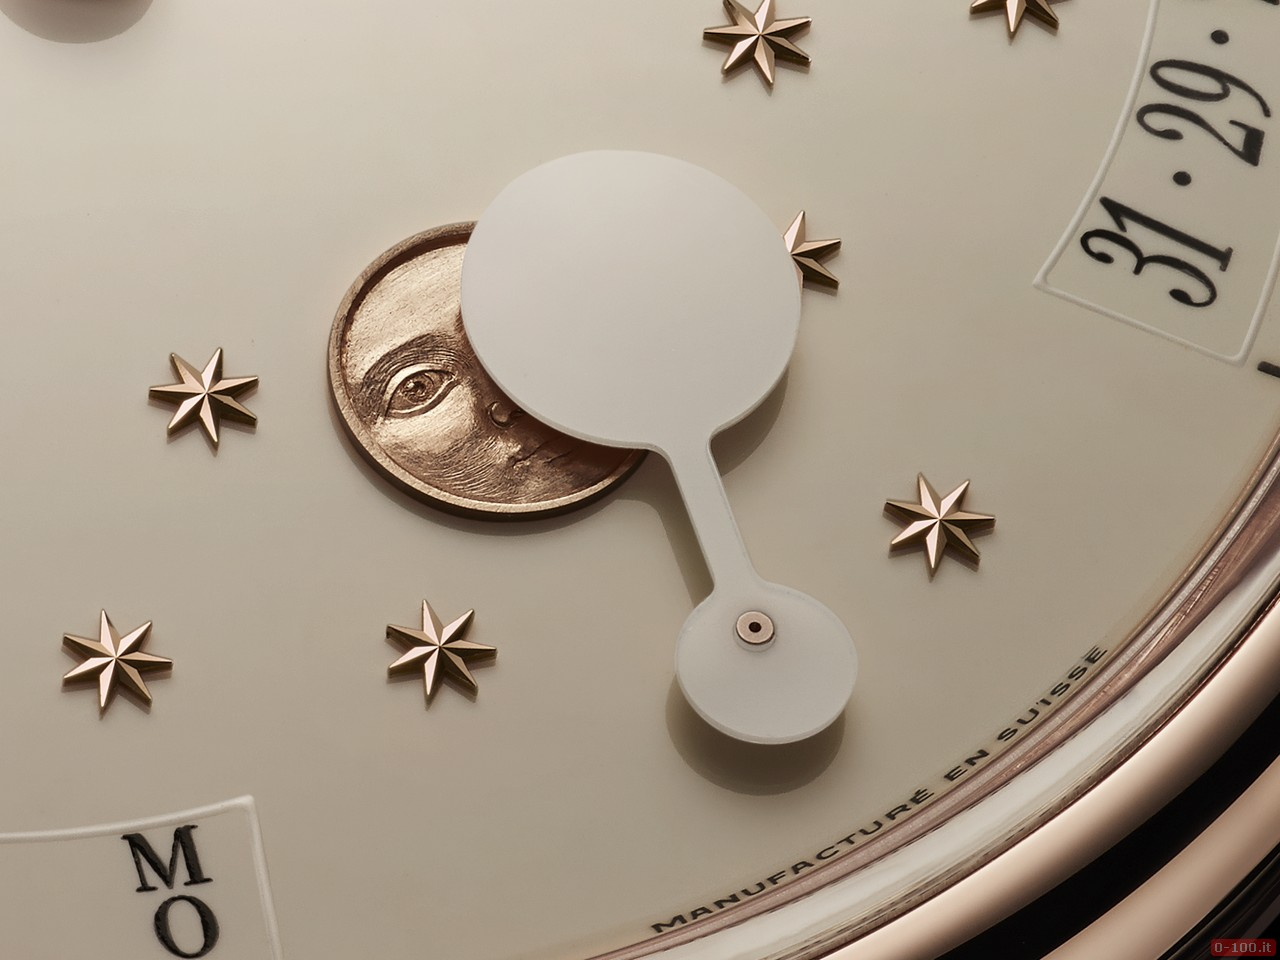 jaquet-droz-perpetual-calendar-eclipse-1009